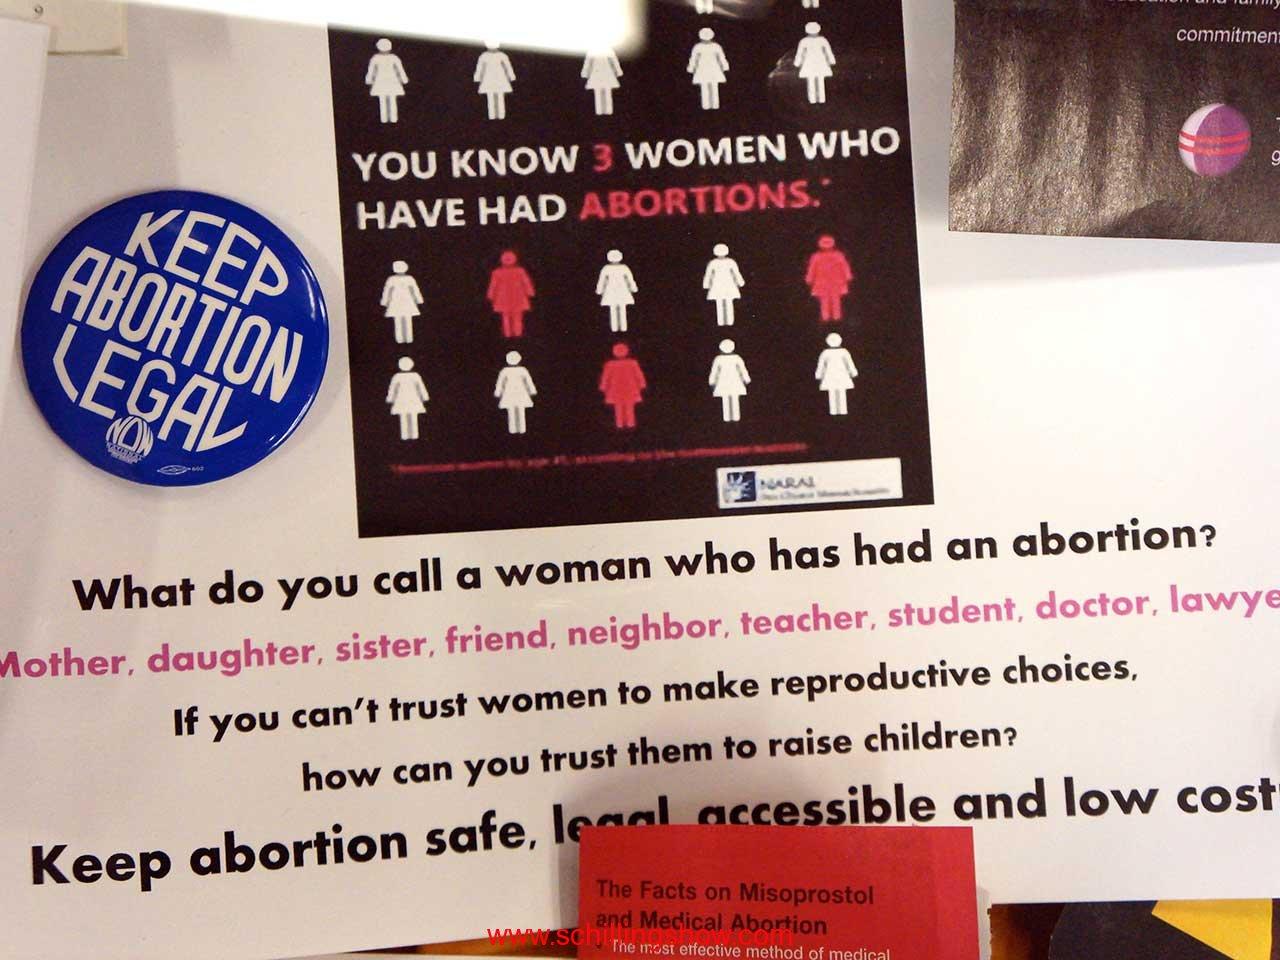 Keep-Abortion-Legal